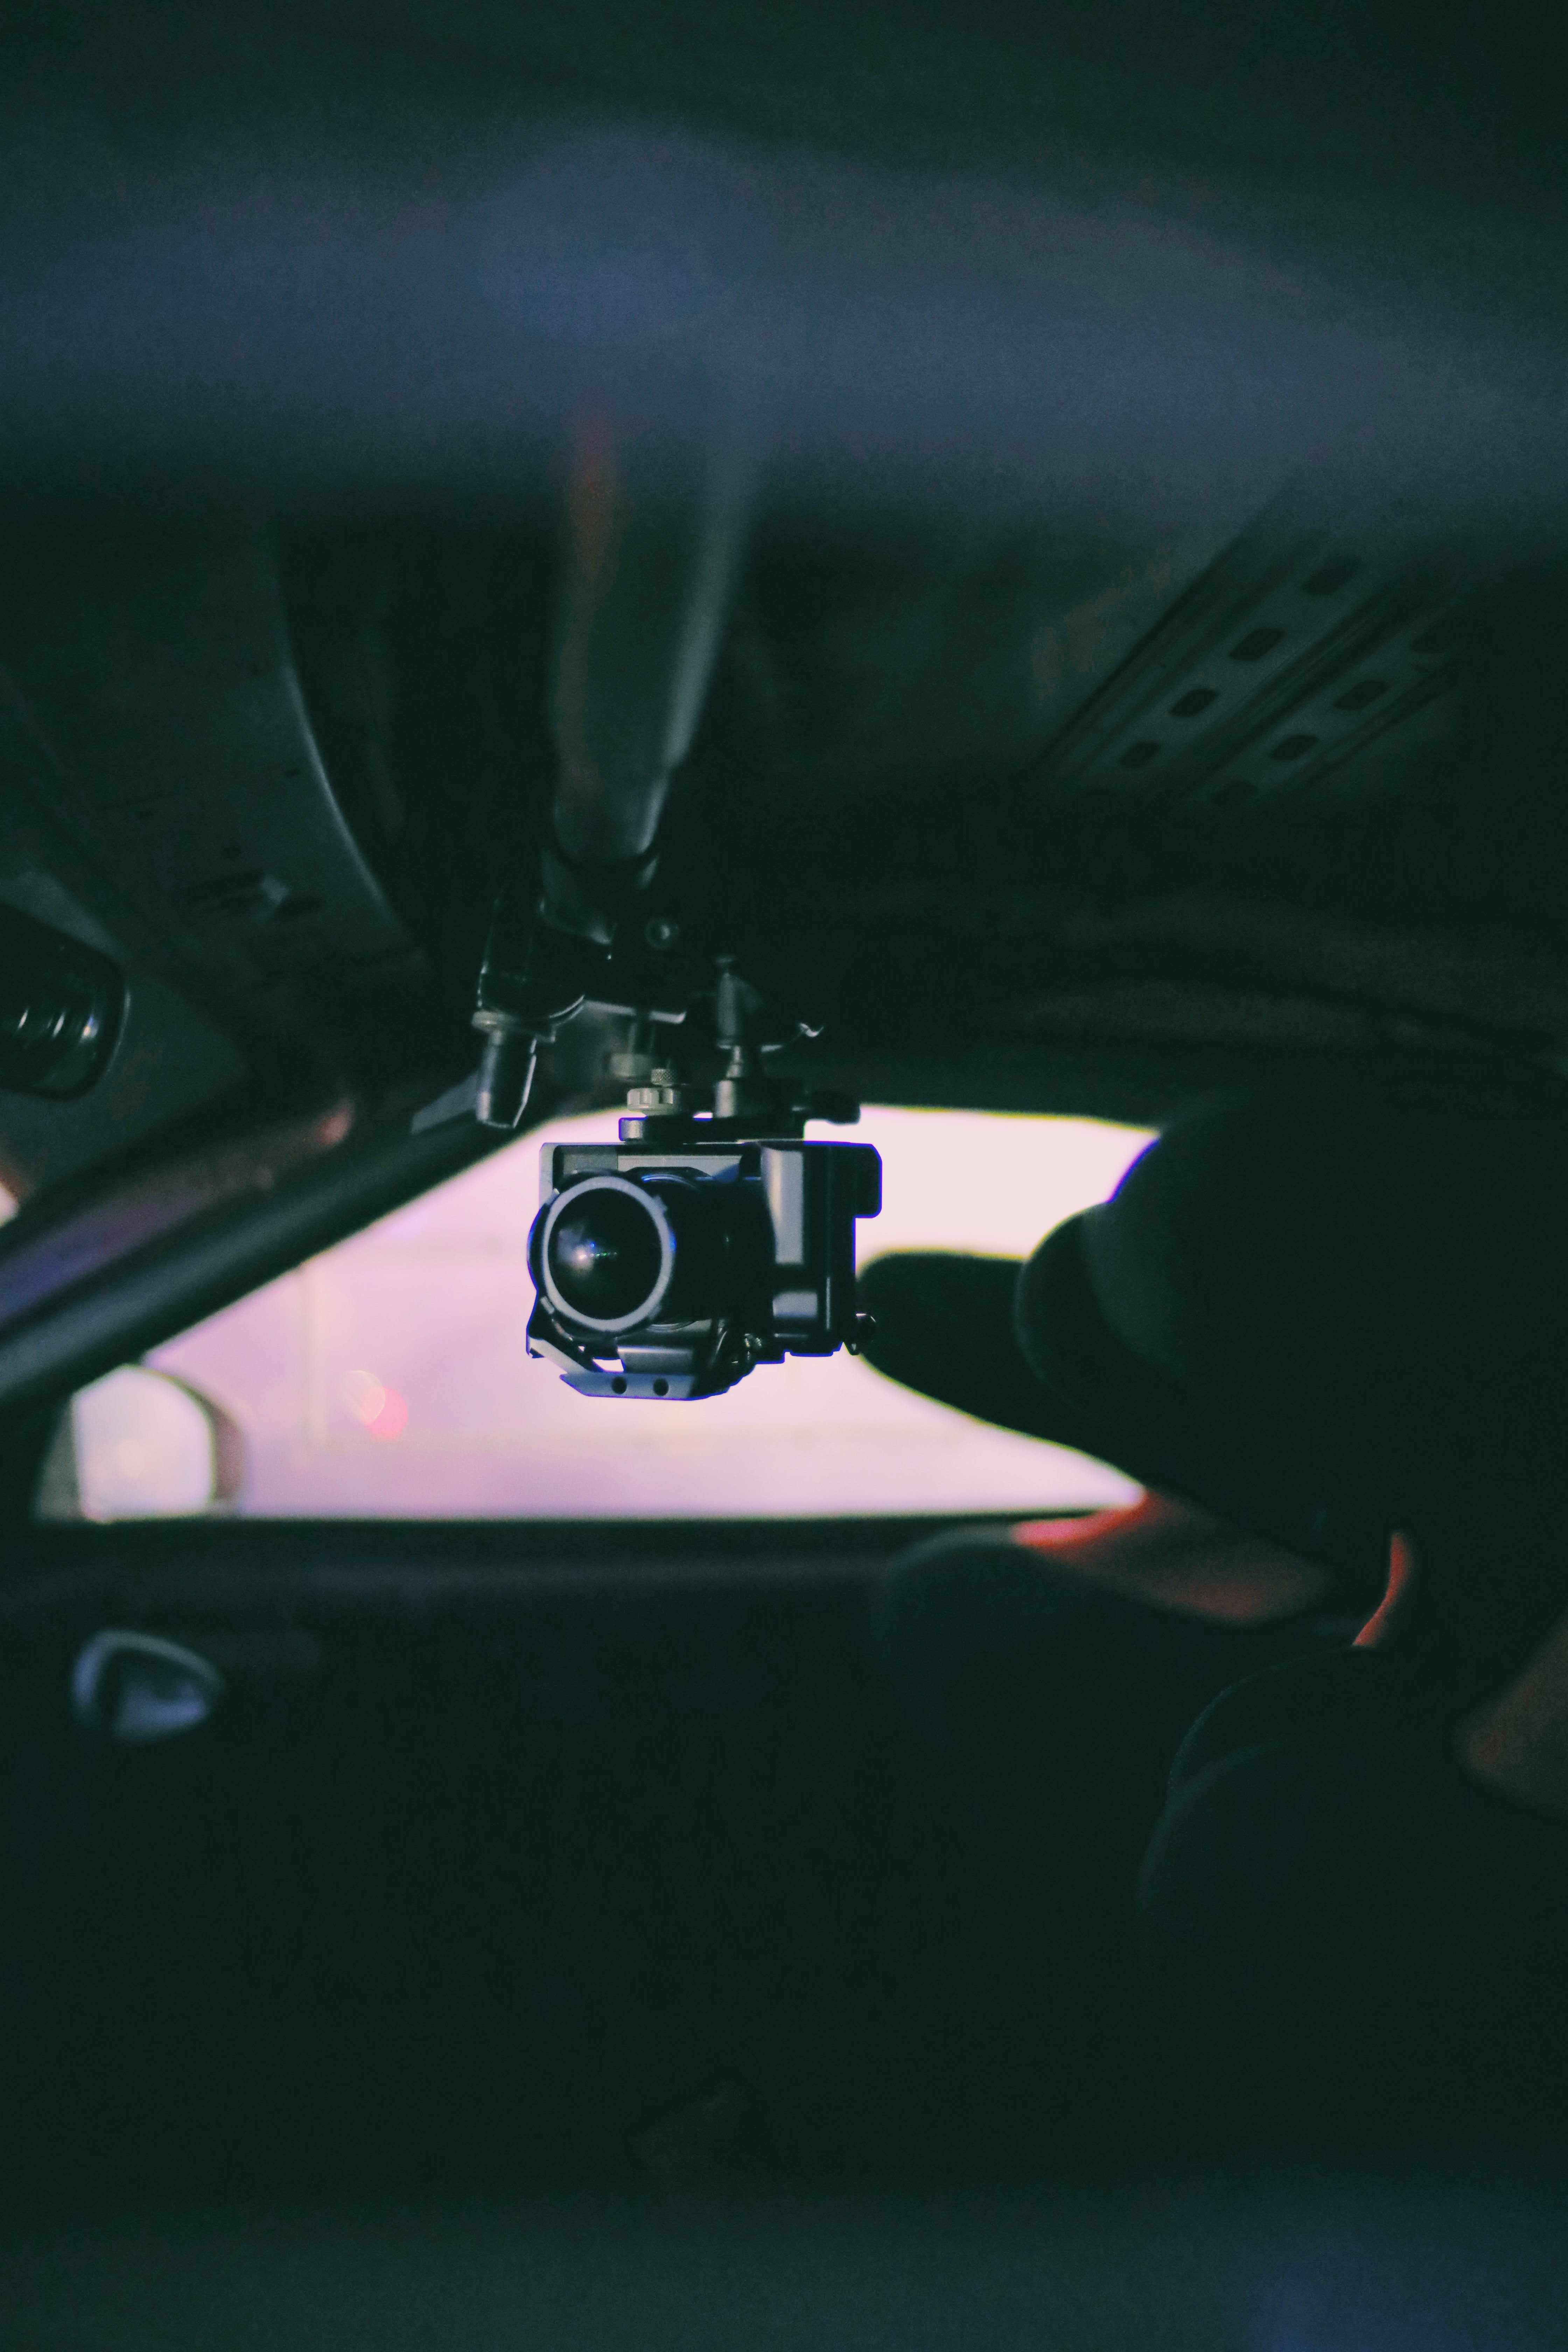 Kostenloses Stock Foto zu auto, autoinnenraum, automobil, dunkel